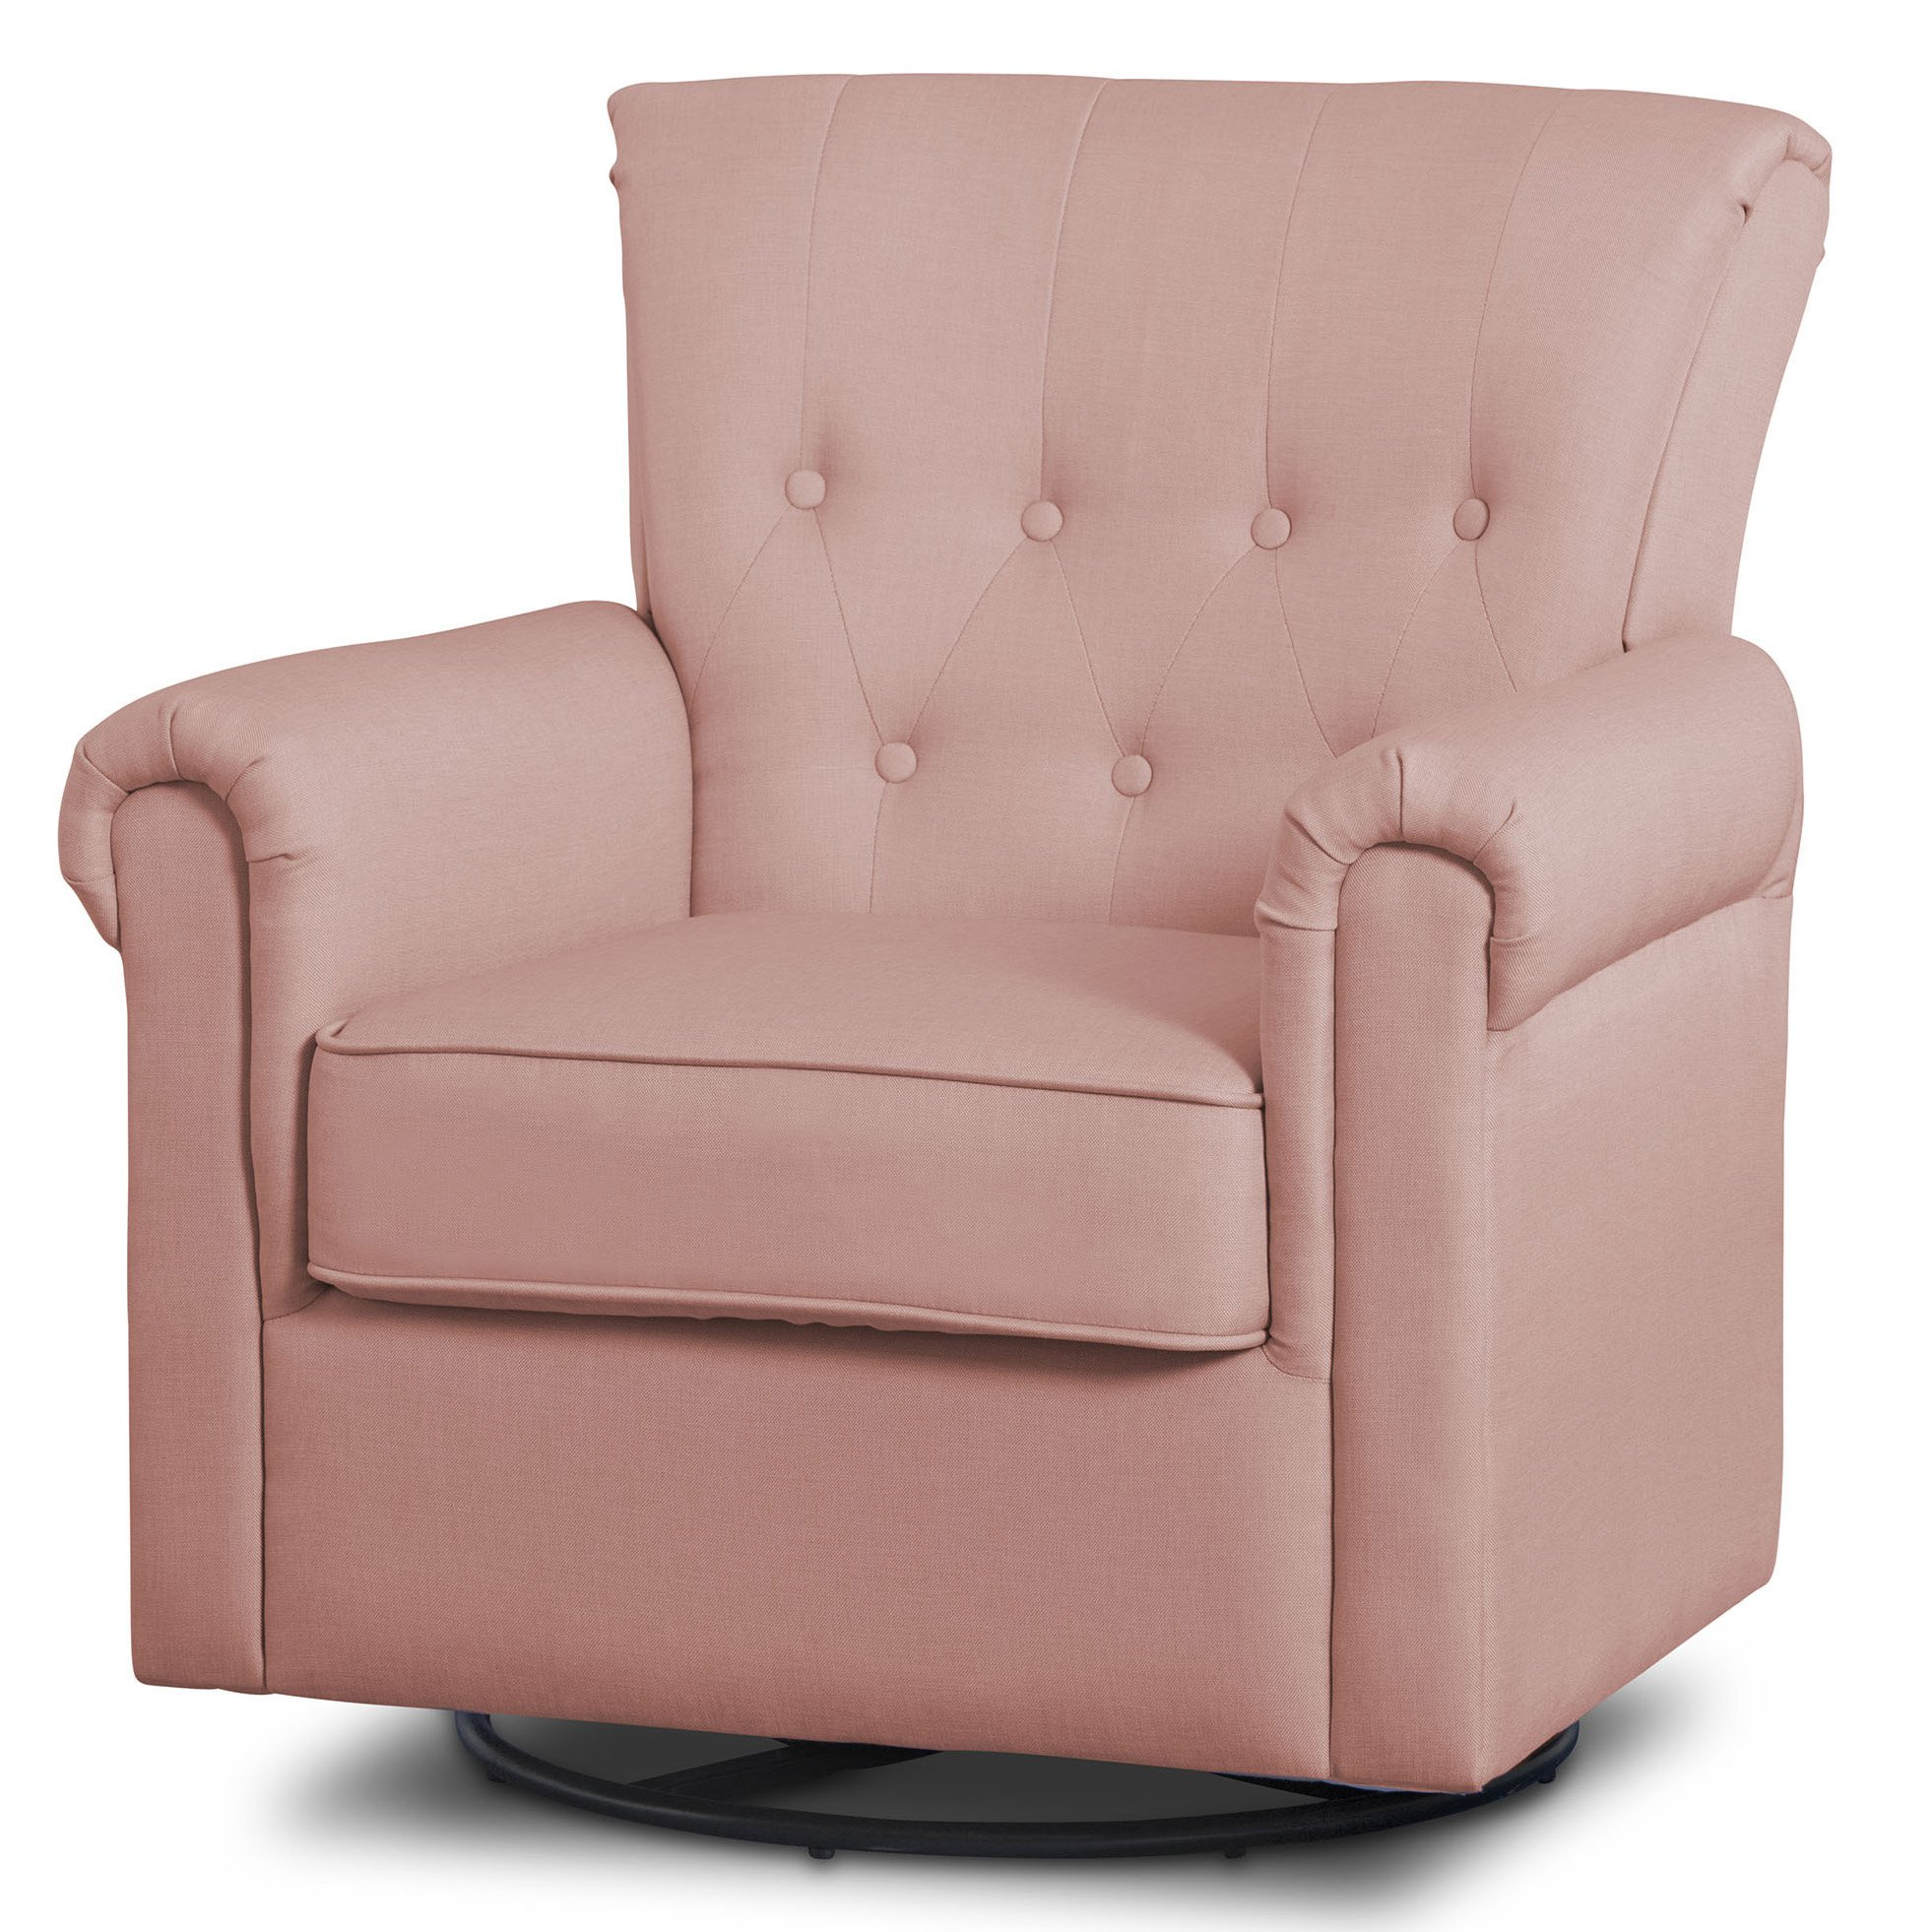 Pottery Barn Kids Chair Cushions Chair Pads Amp Cushions